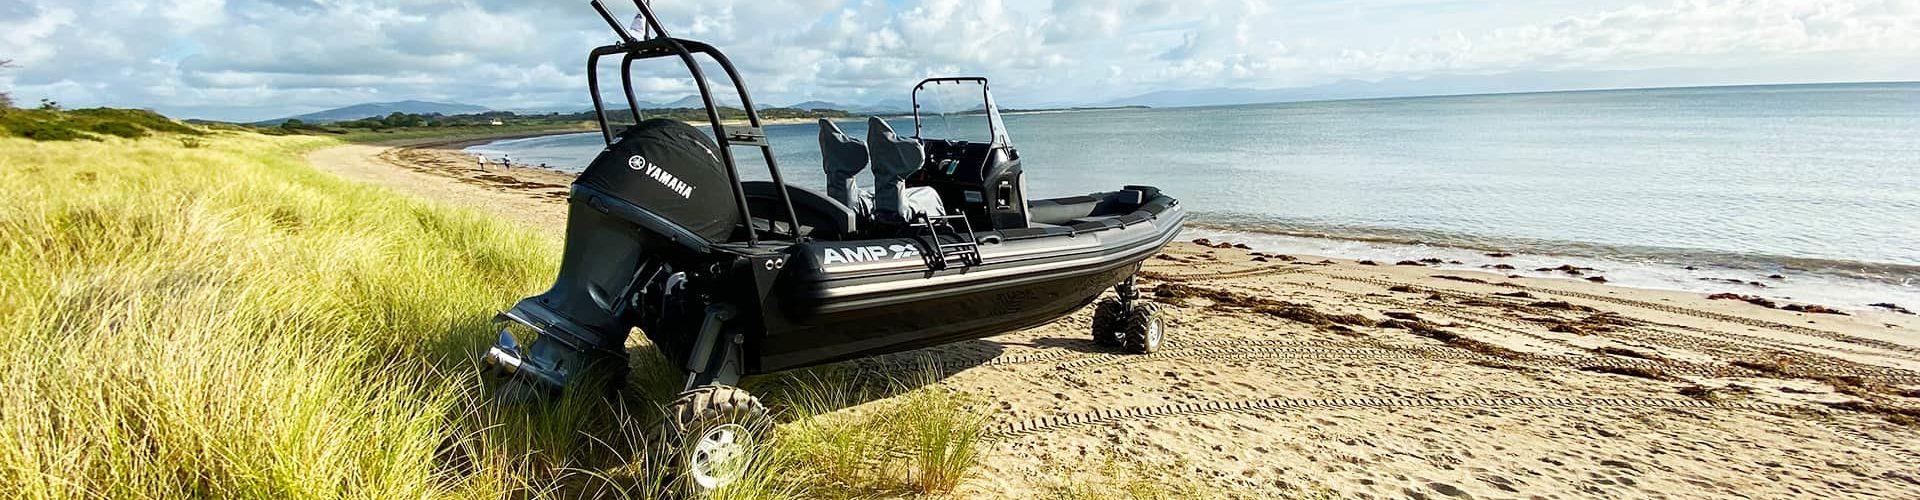 amphibious 7.1M